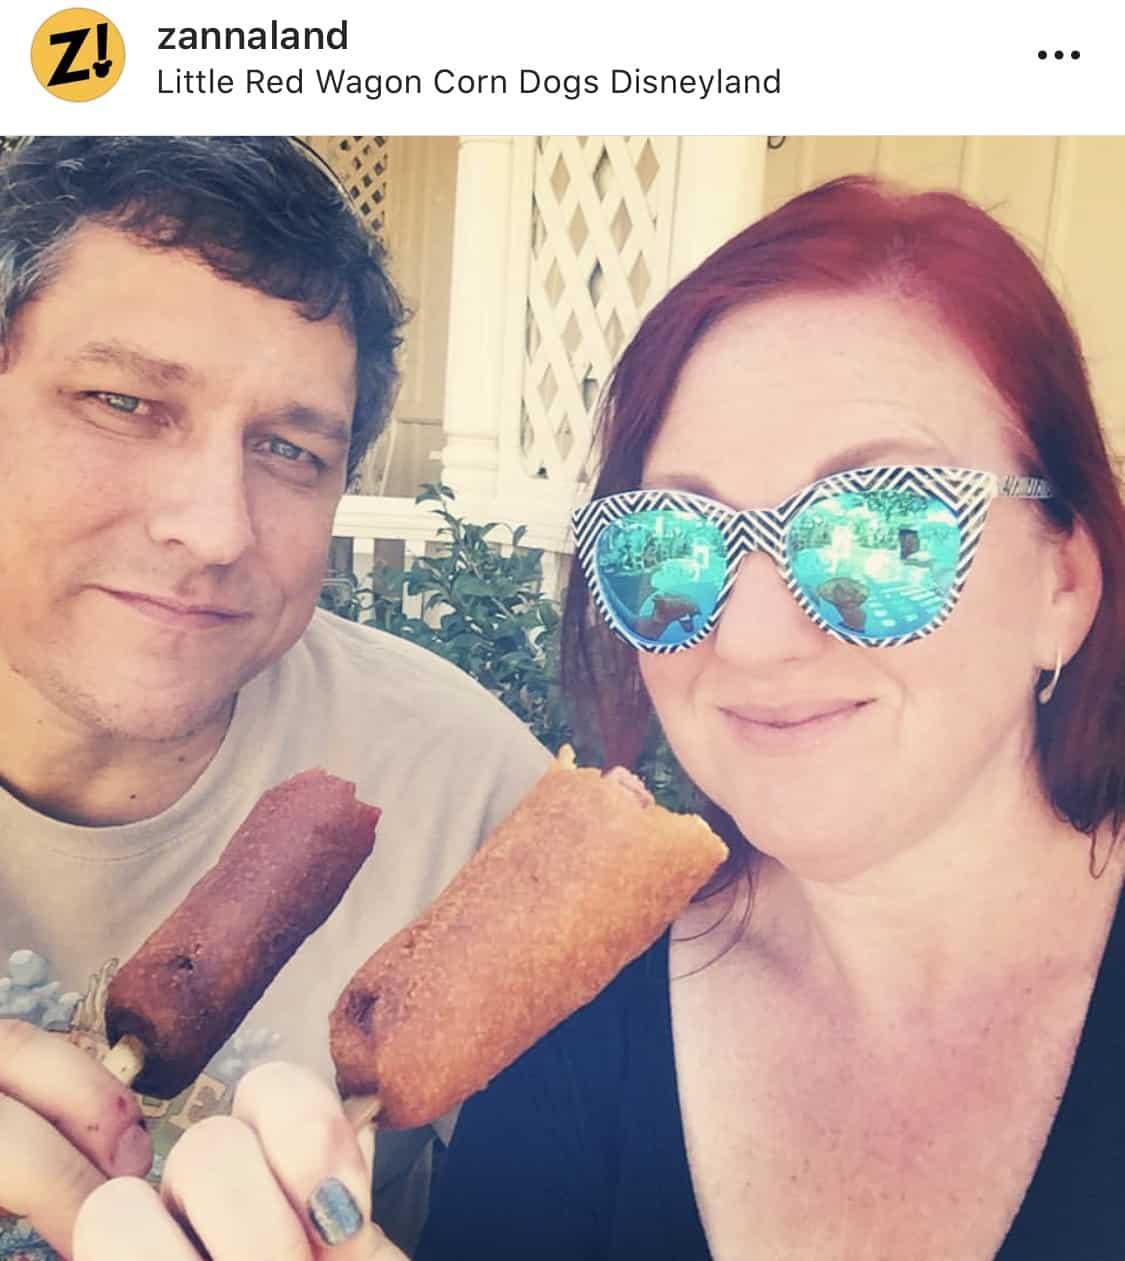 Disneyland Corn Dog